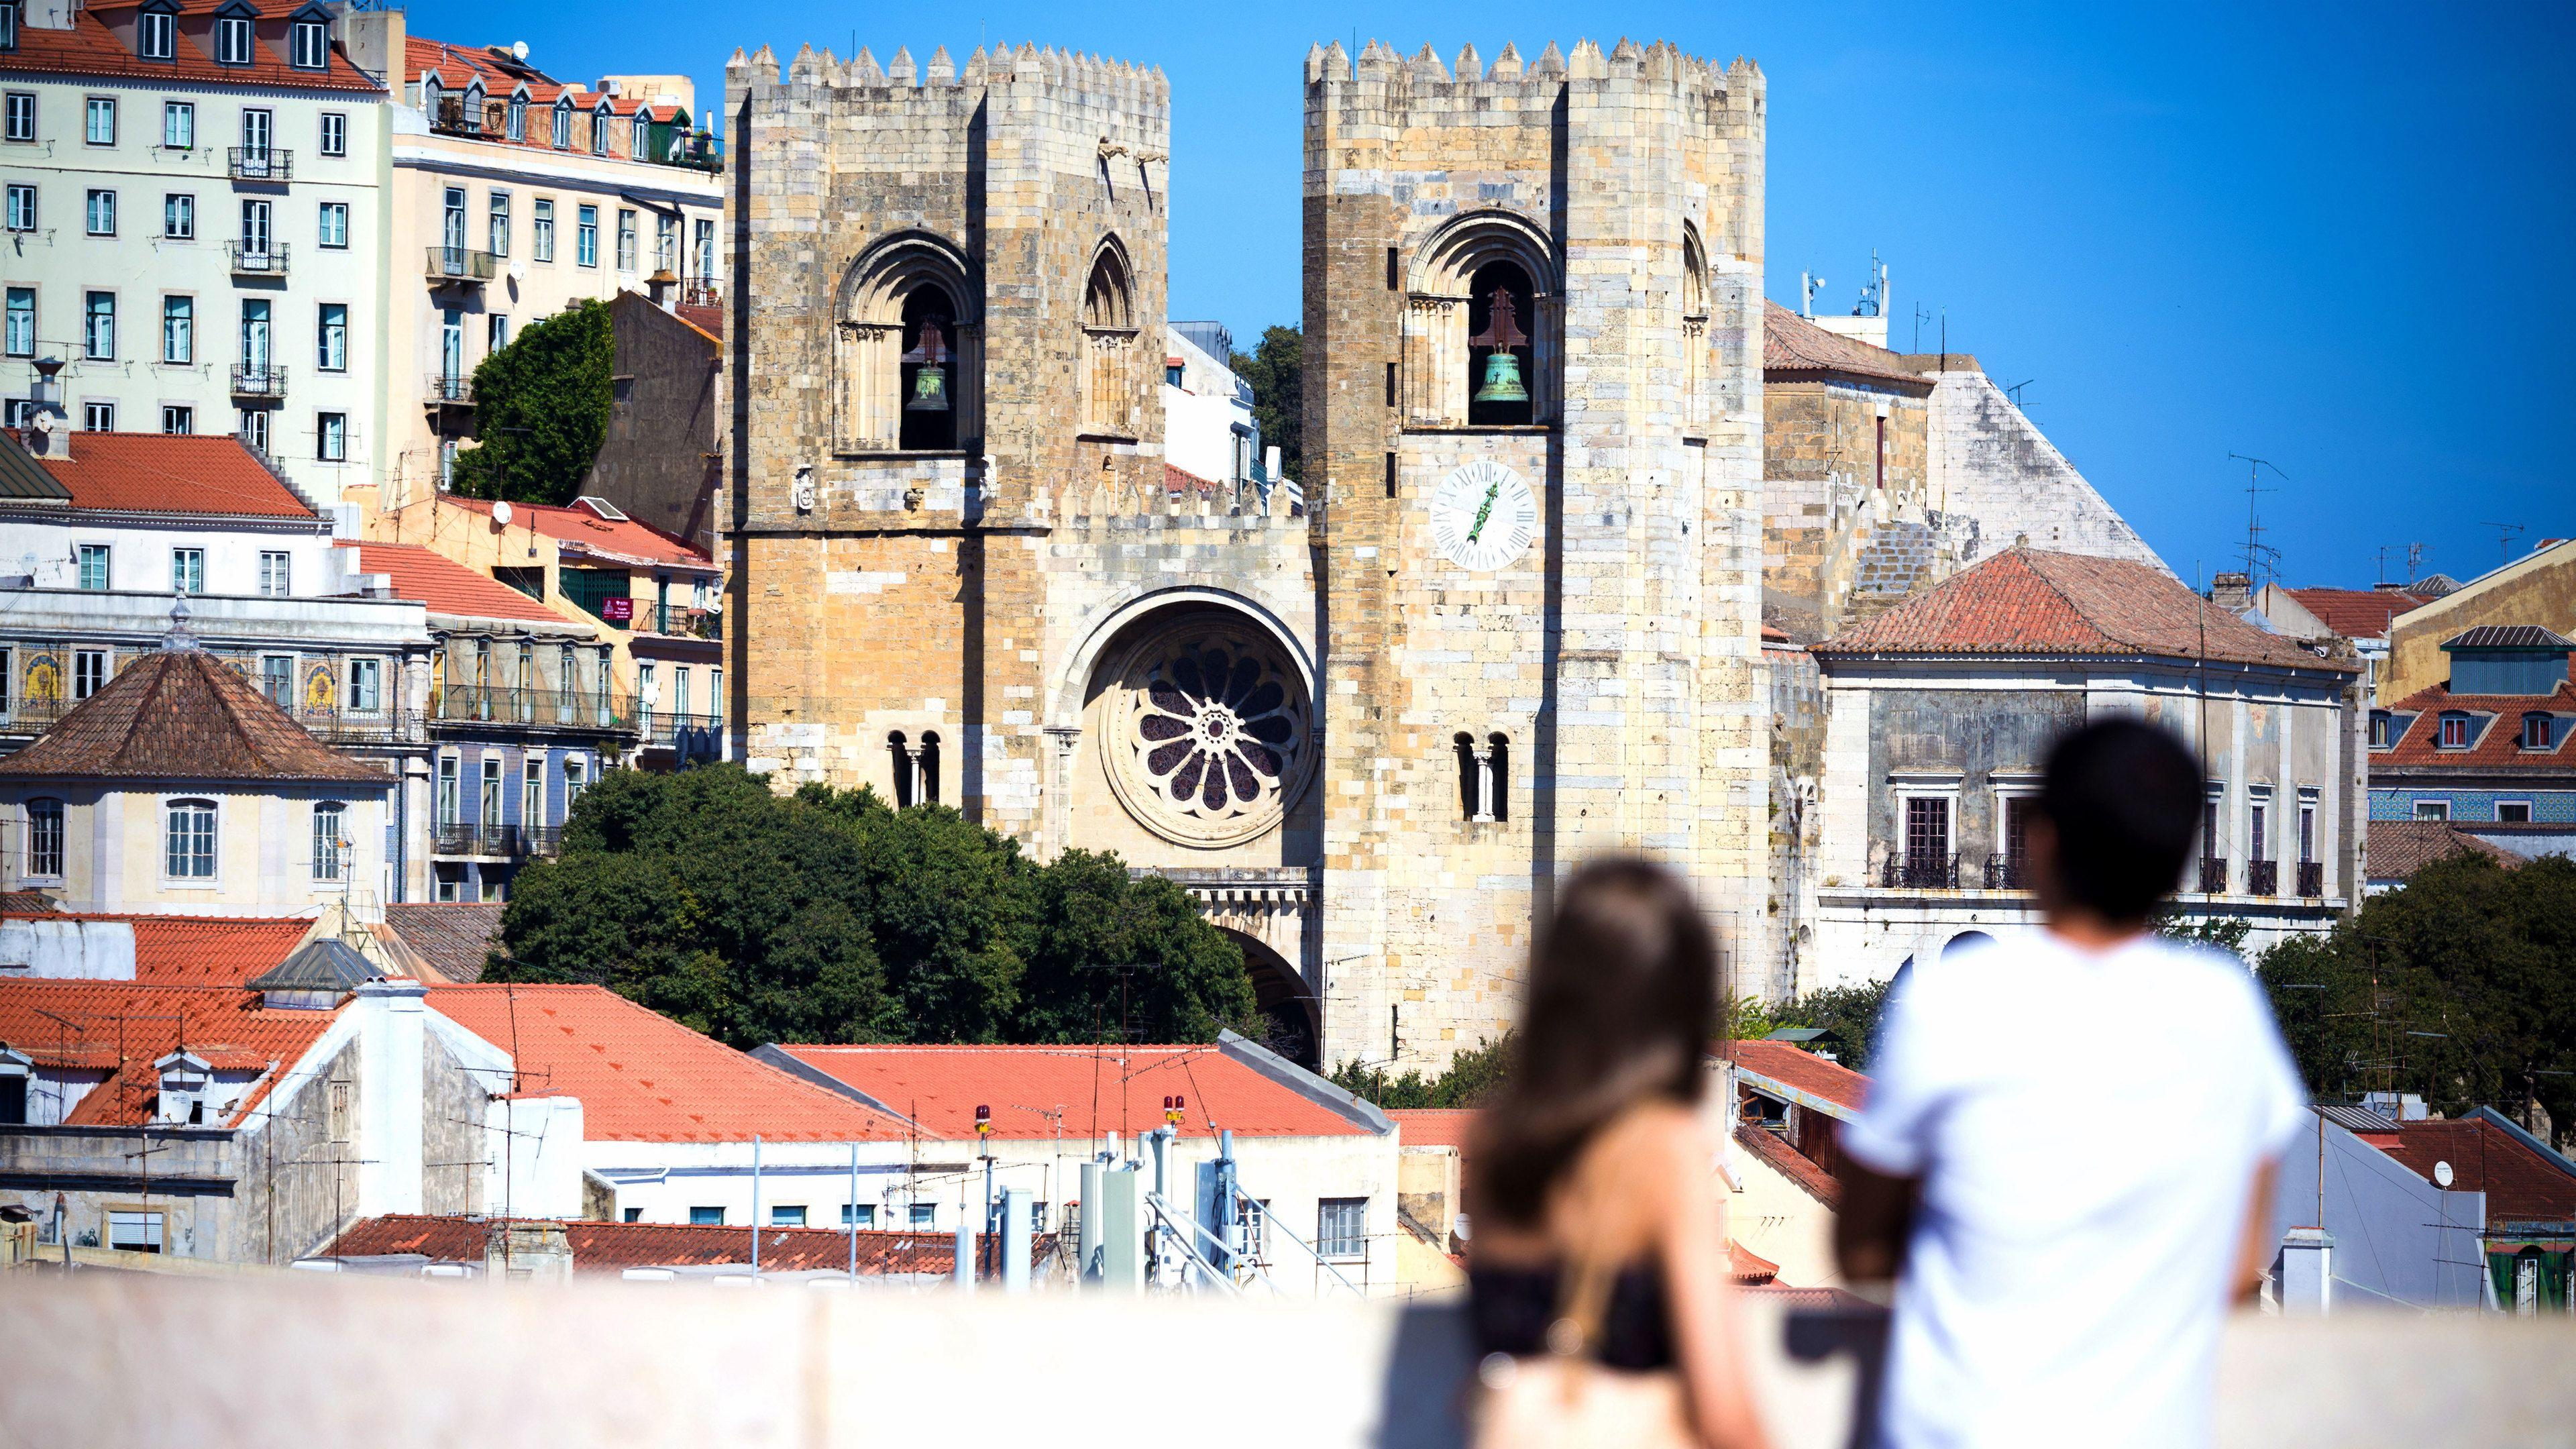 Se Cathedral, Lisbon's oldest church